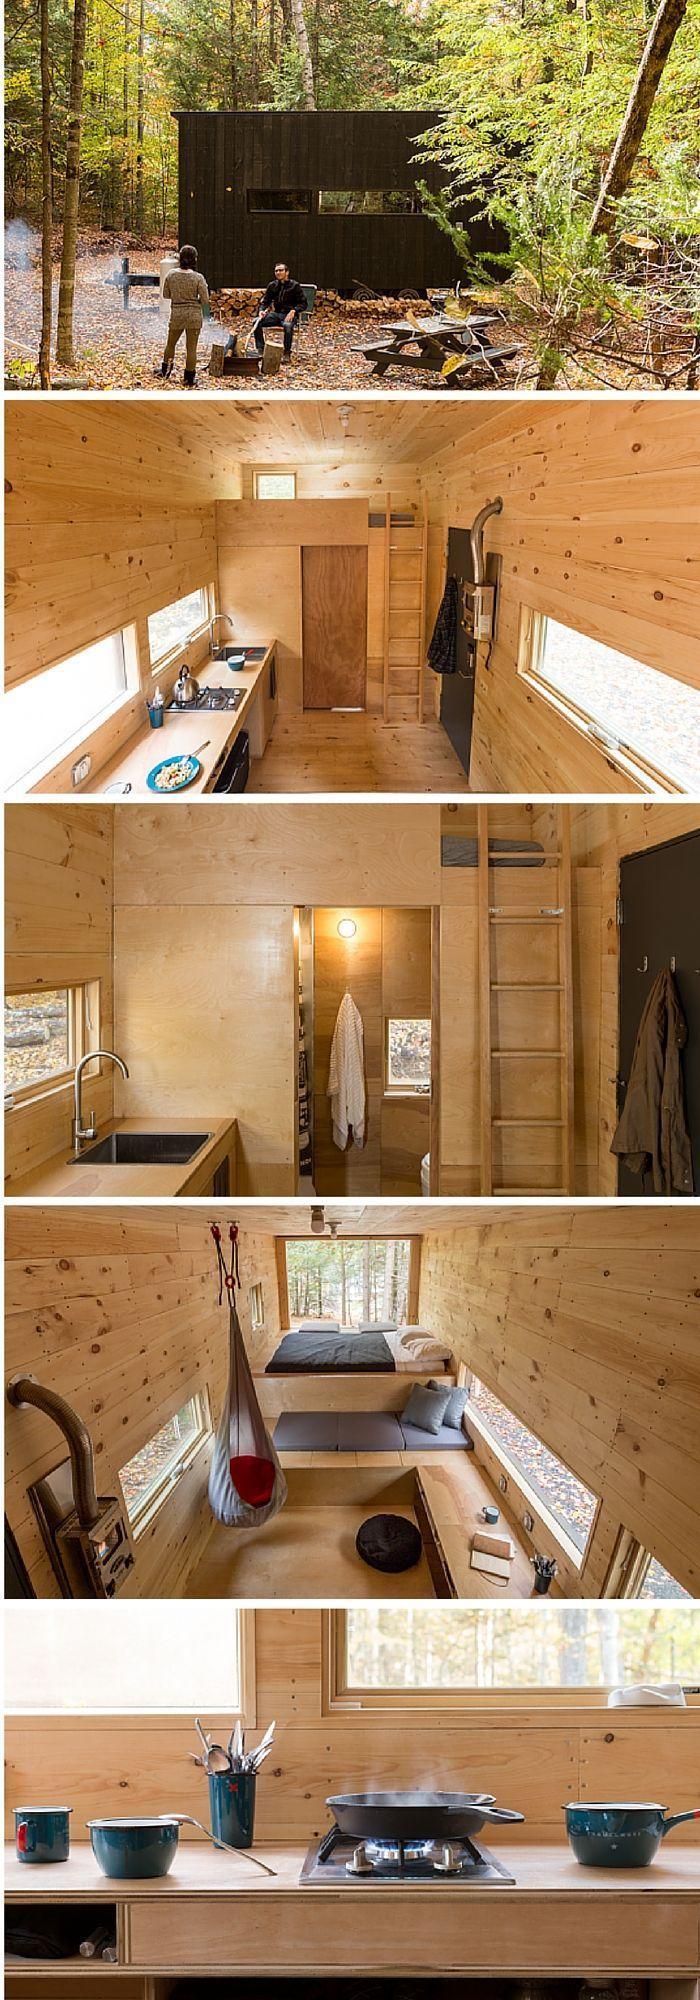 THE CLARA U2013 160 SQ FT TINY HOUSES ON WHEELS